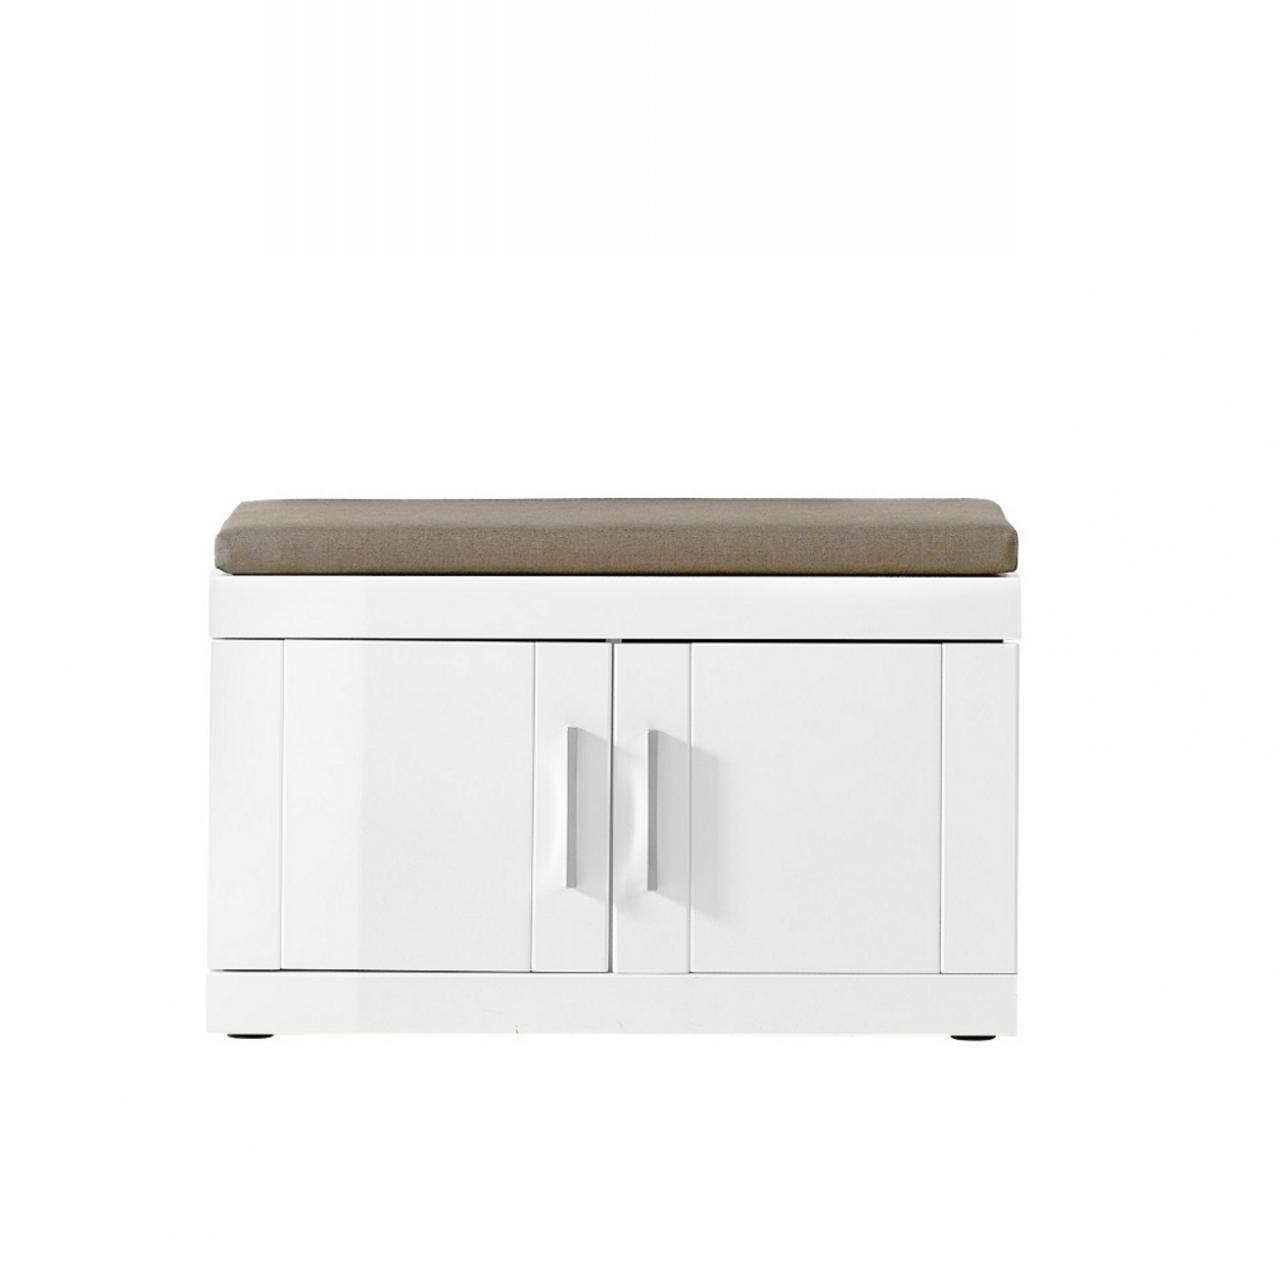 Garderobenbank Juno - Weiß